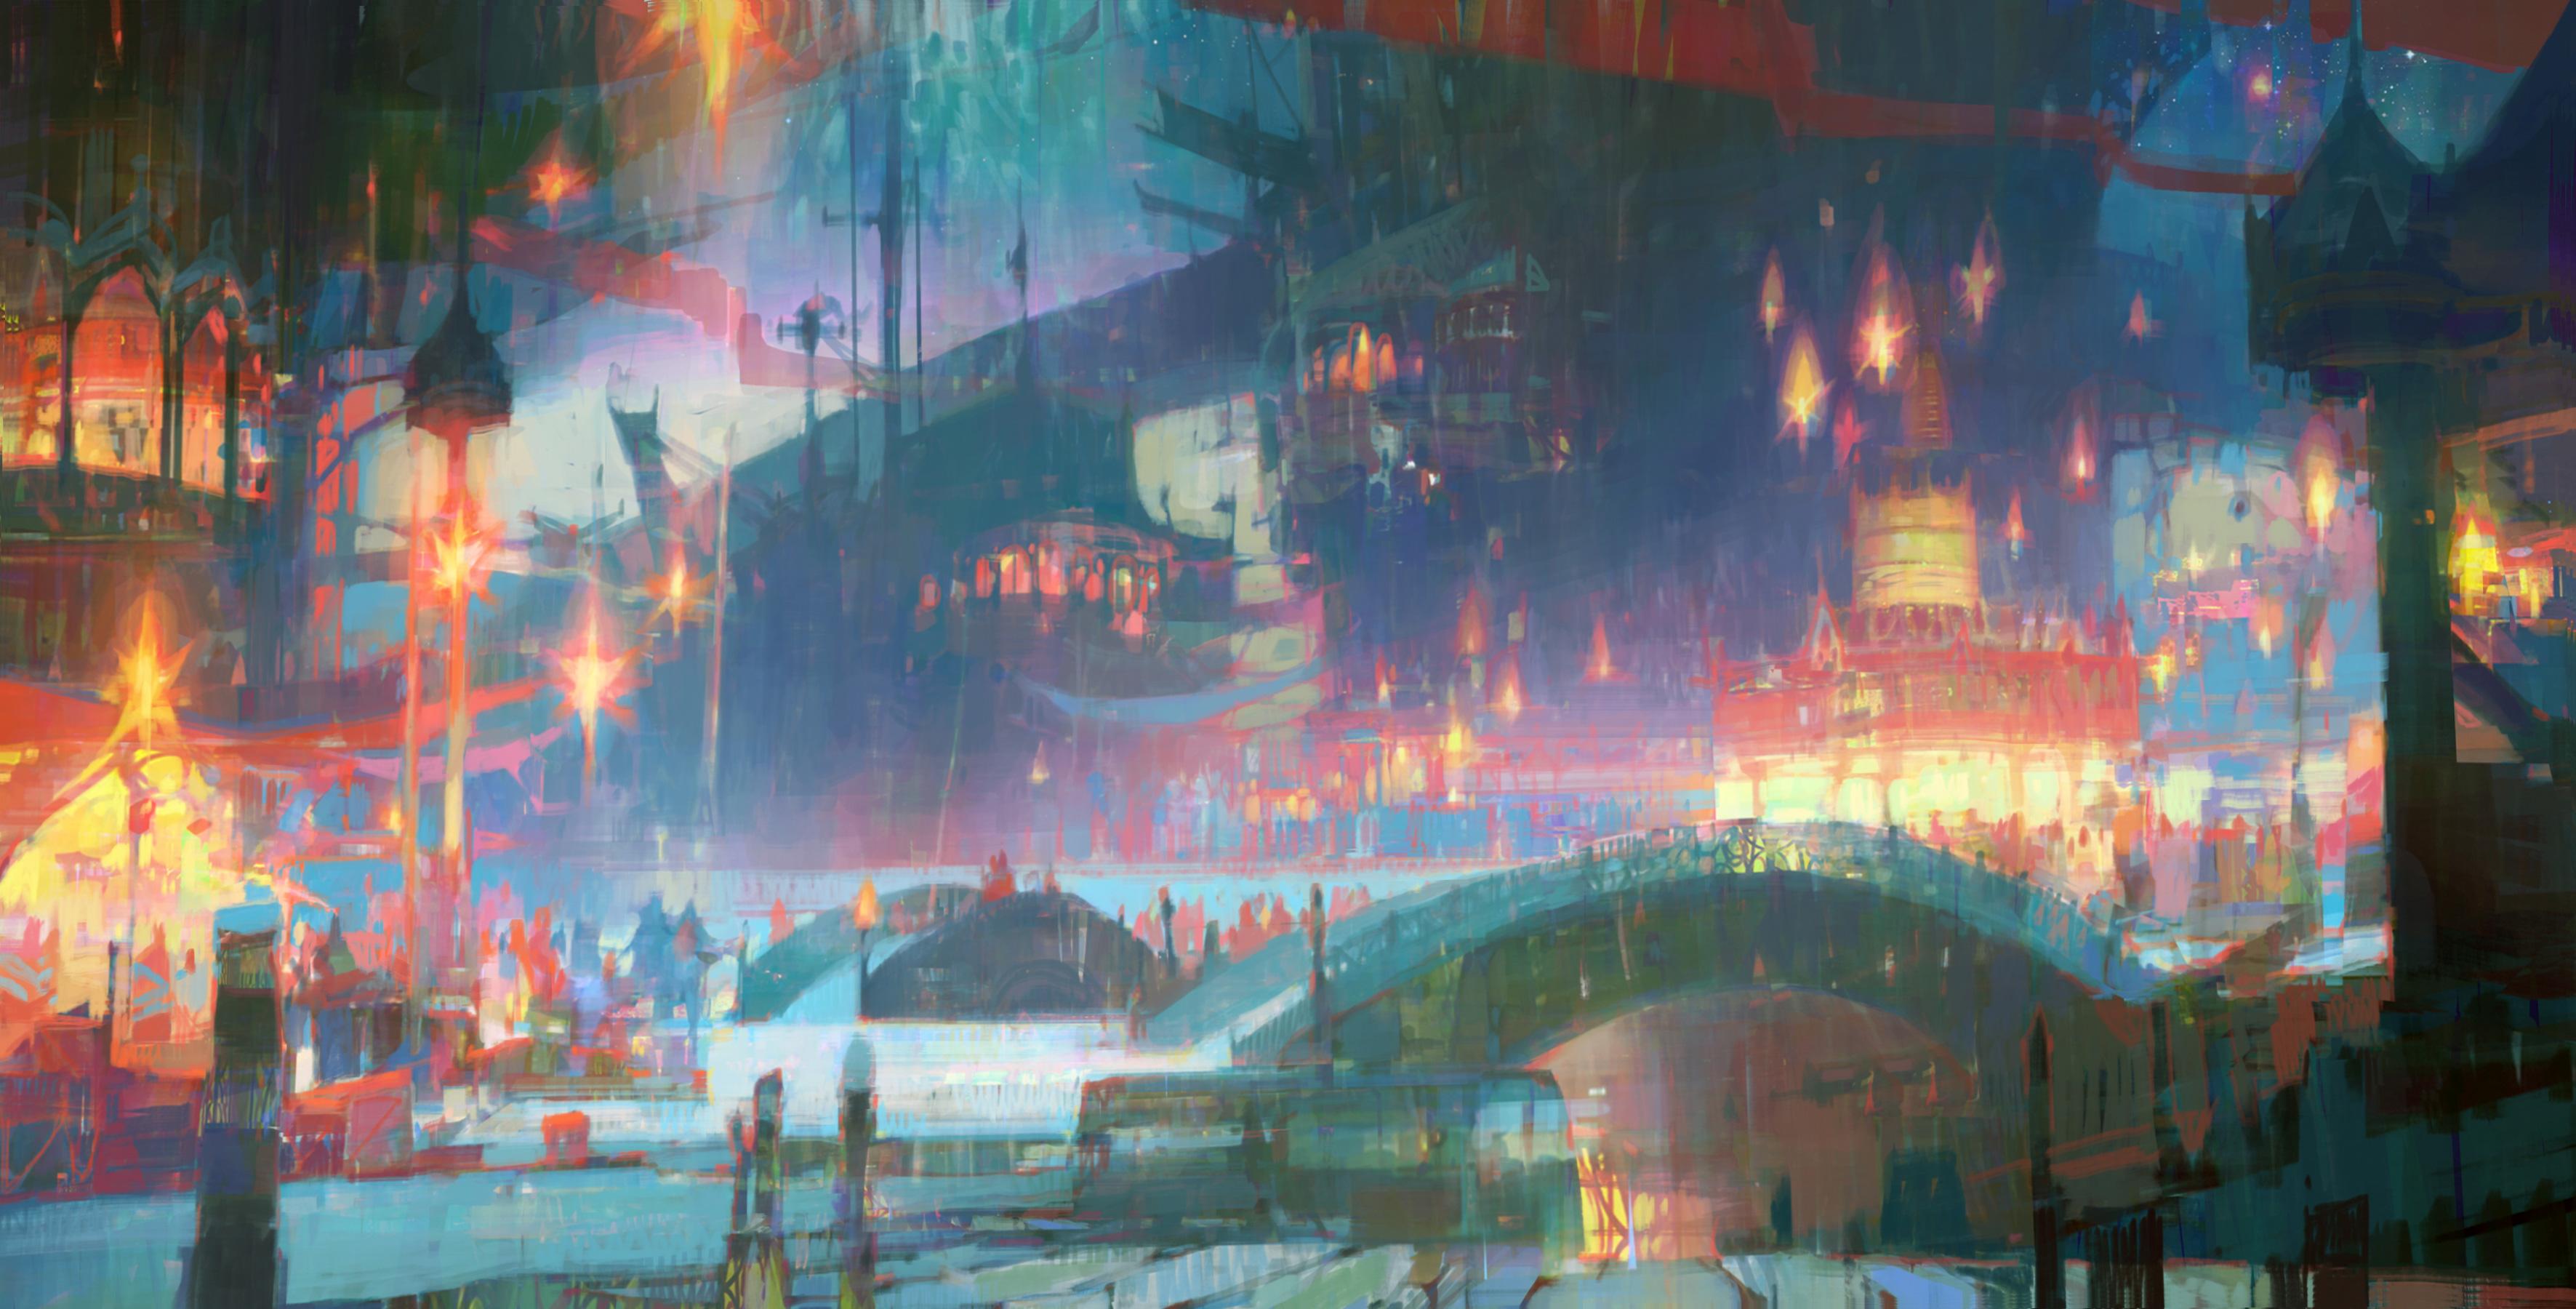 Guild Wars 2 Wintersday Event Begins December 14th #24817